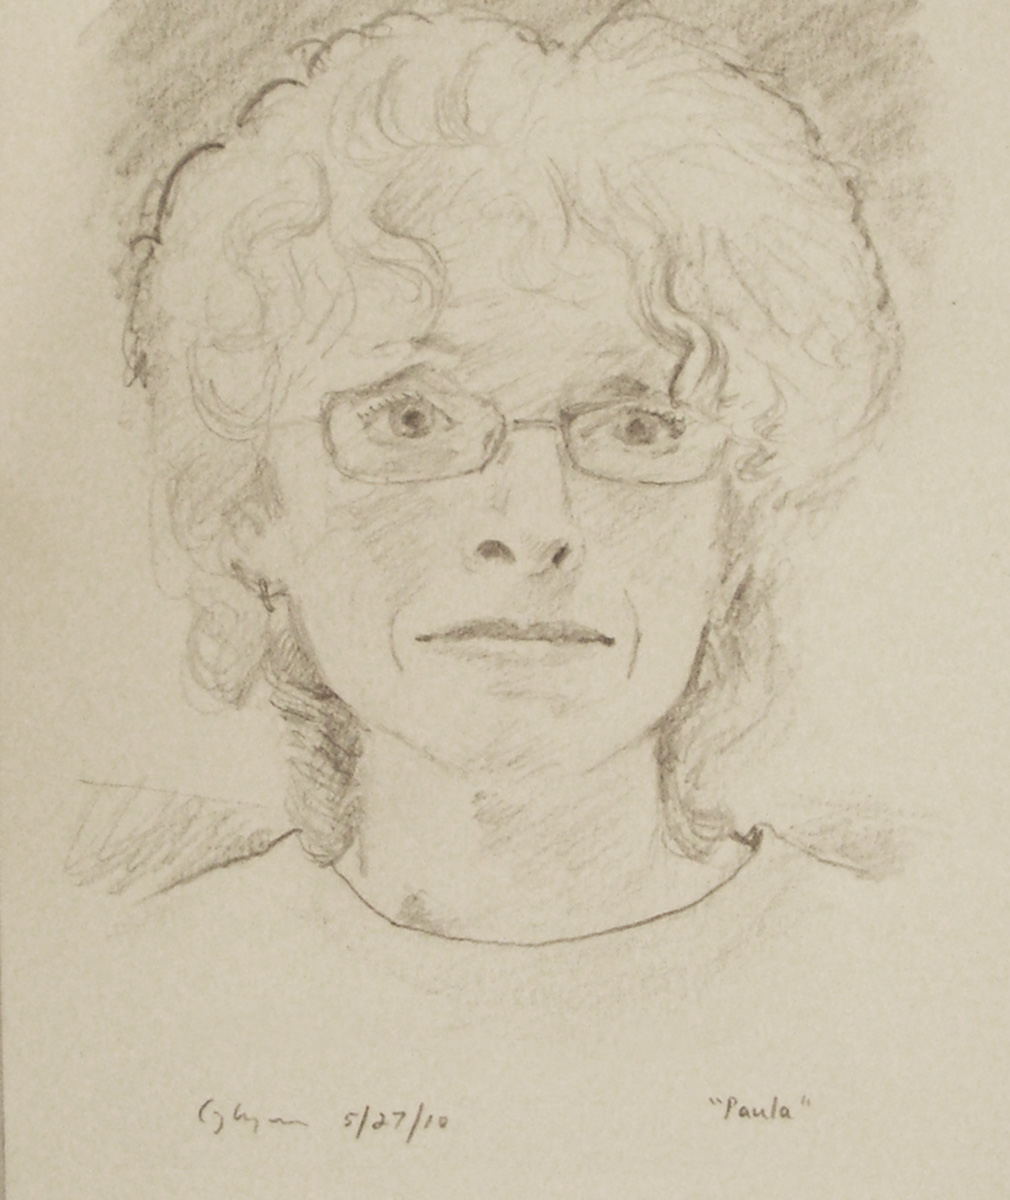 """The artist Paula Marckesano-Jones"" 9"" x 7"" Pencil on paper, 2010"